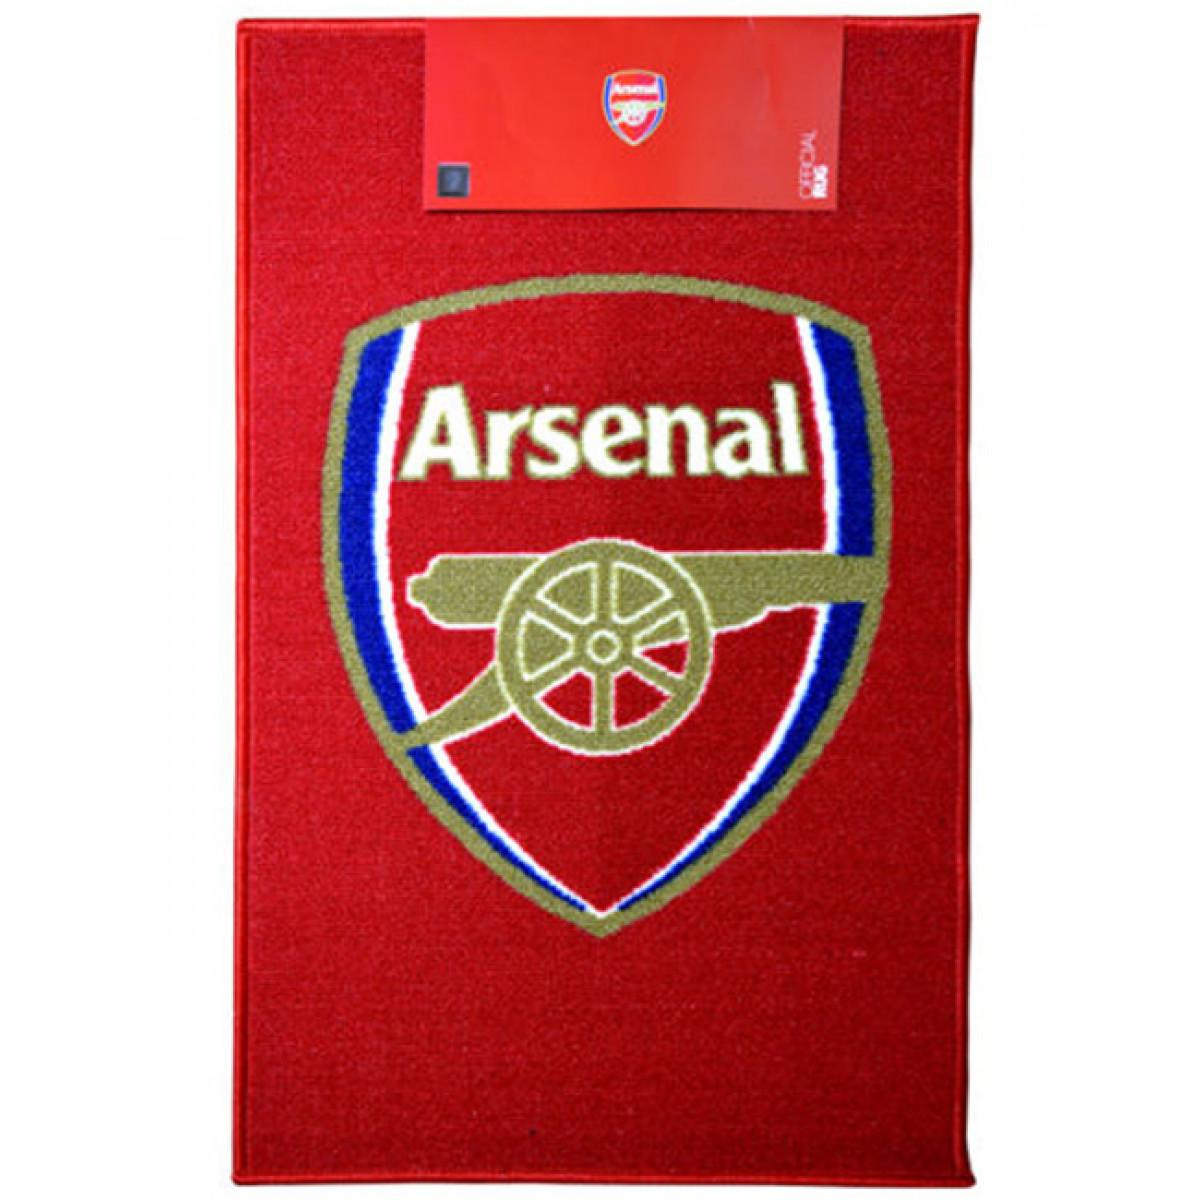 Arsenal Fc Crest Floor Rug